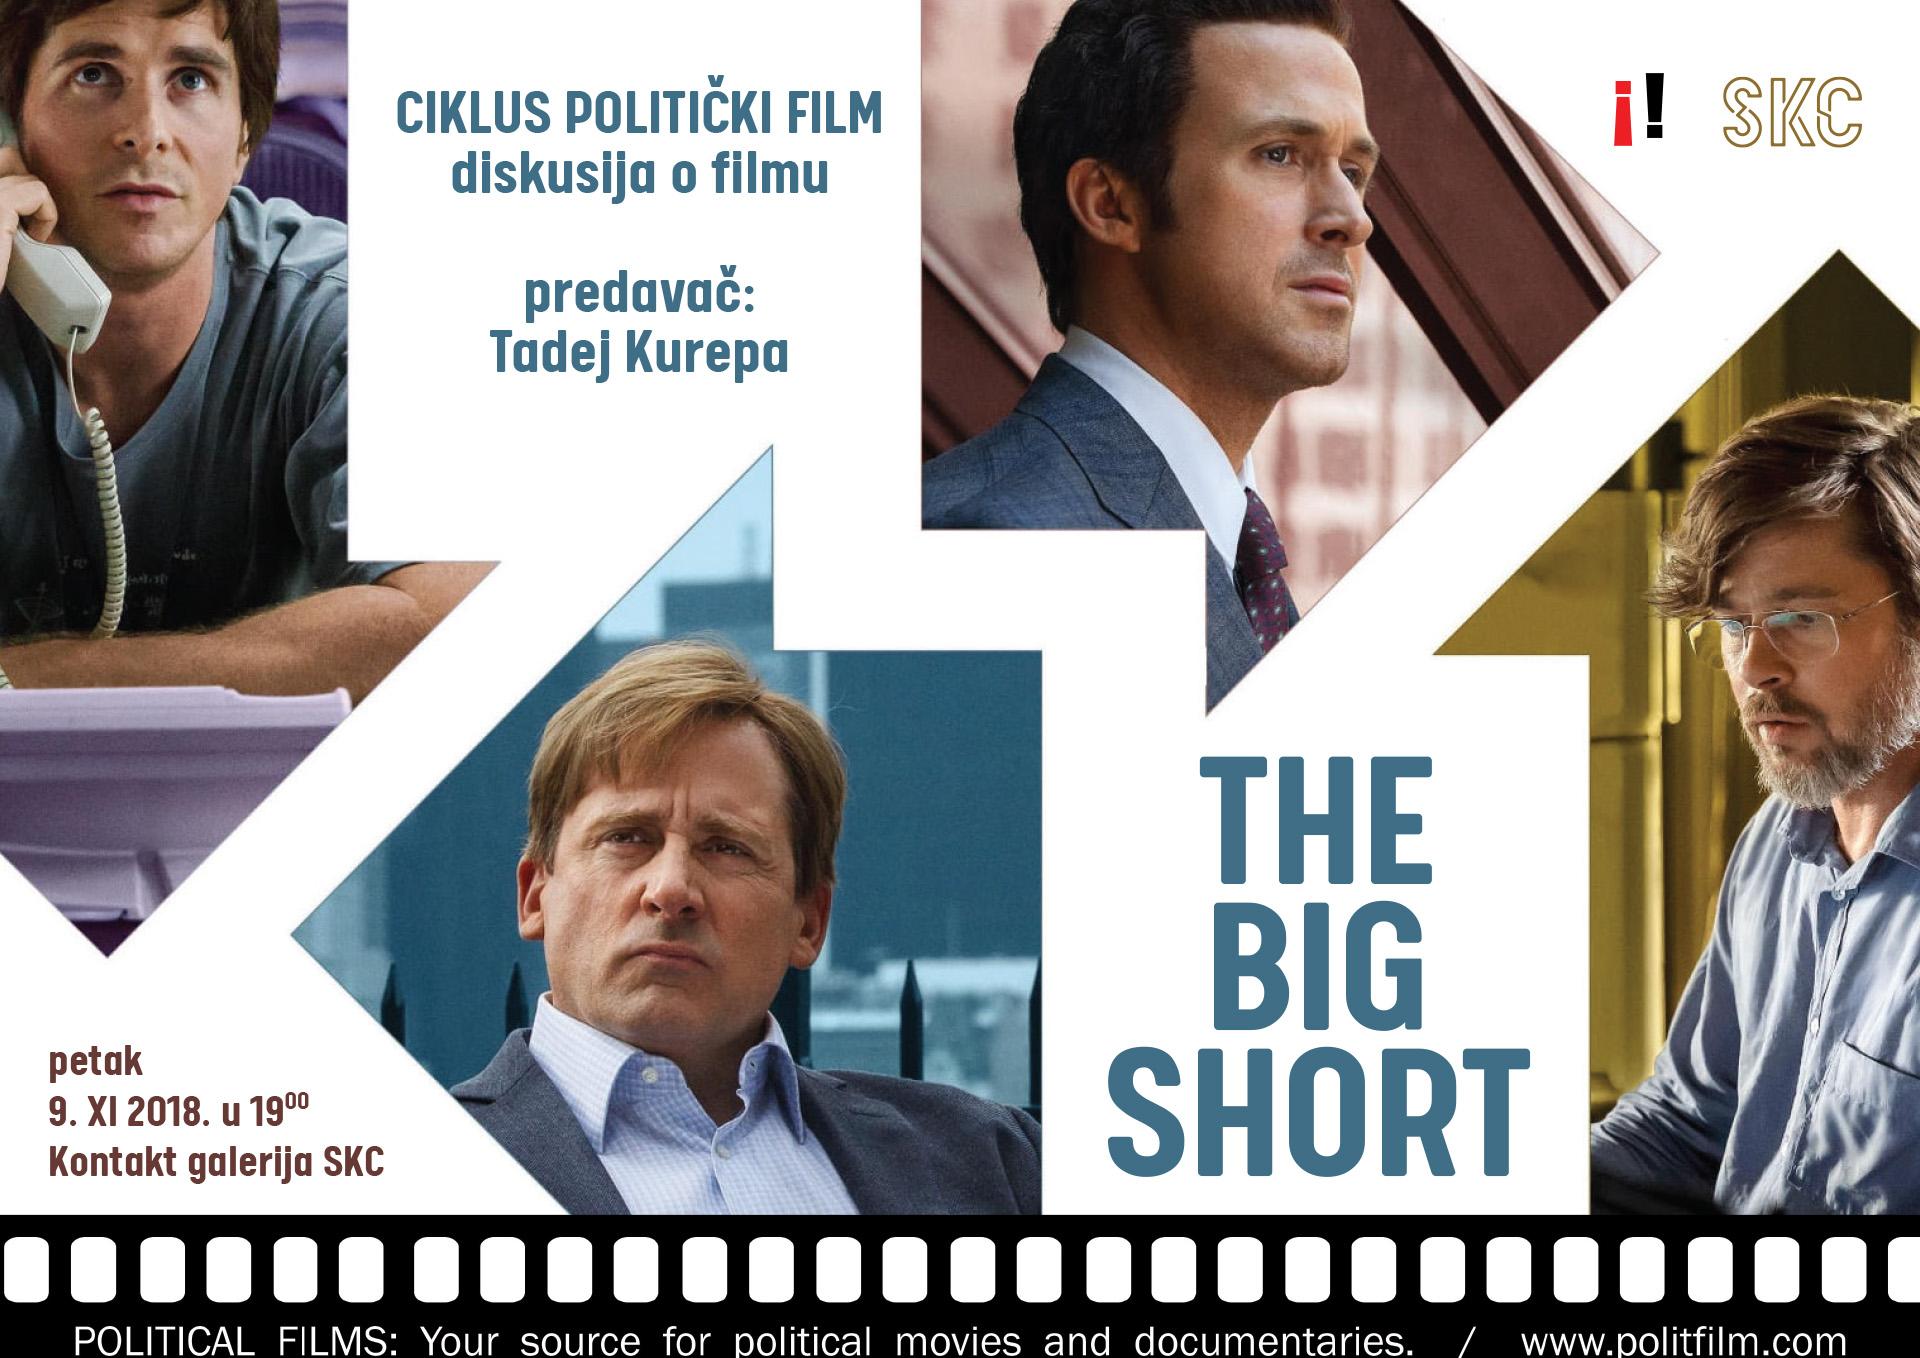 politicki film the big short